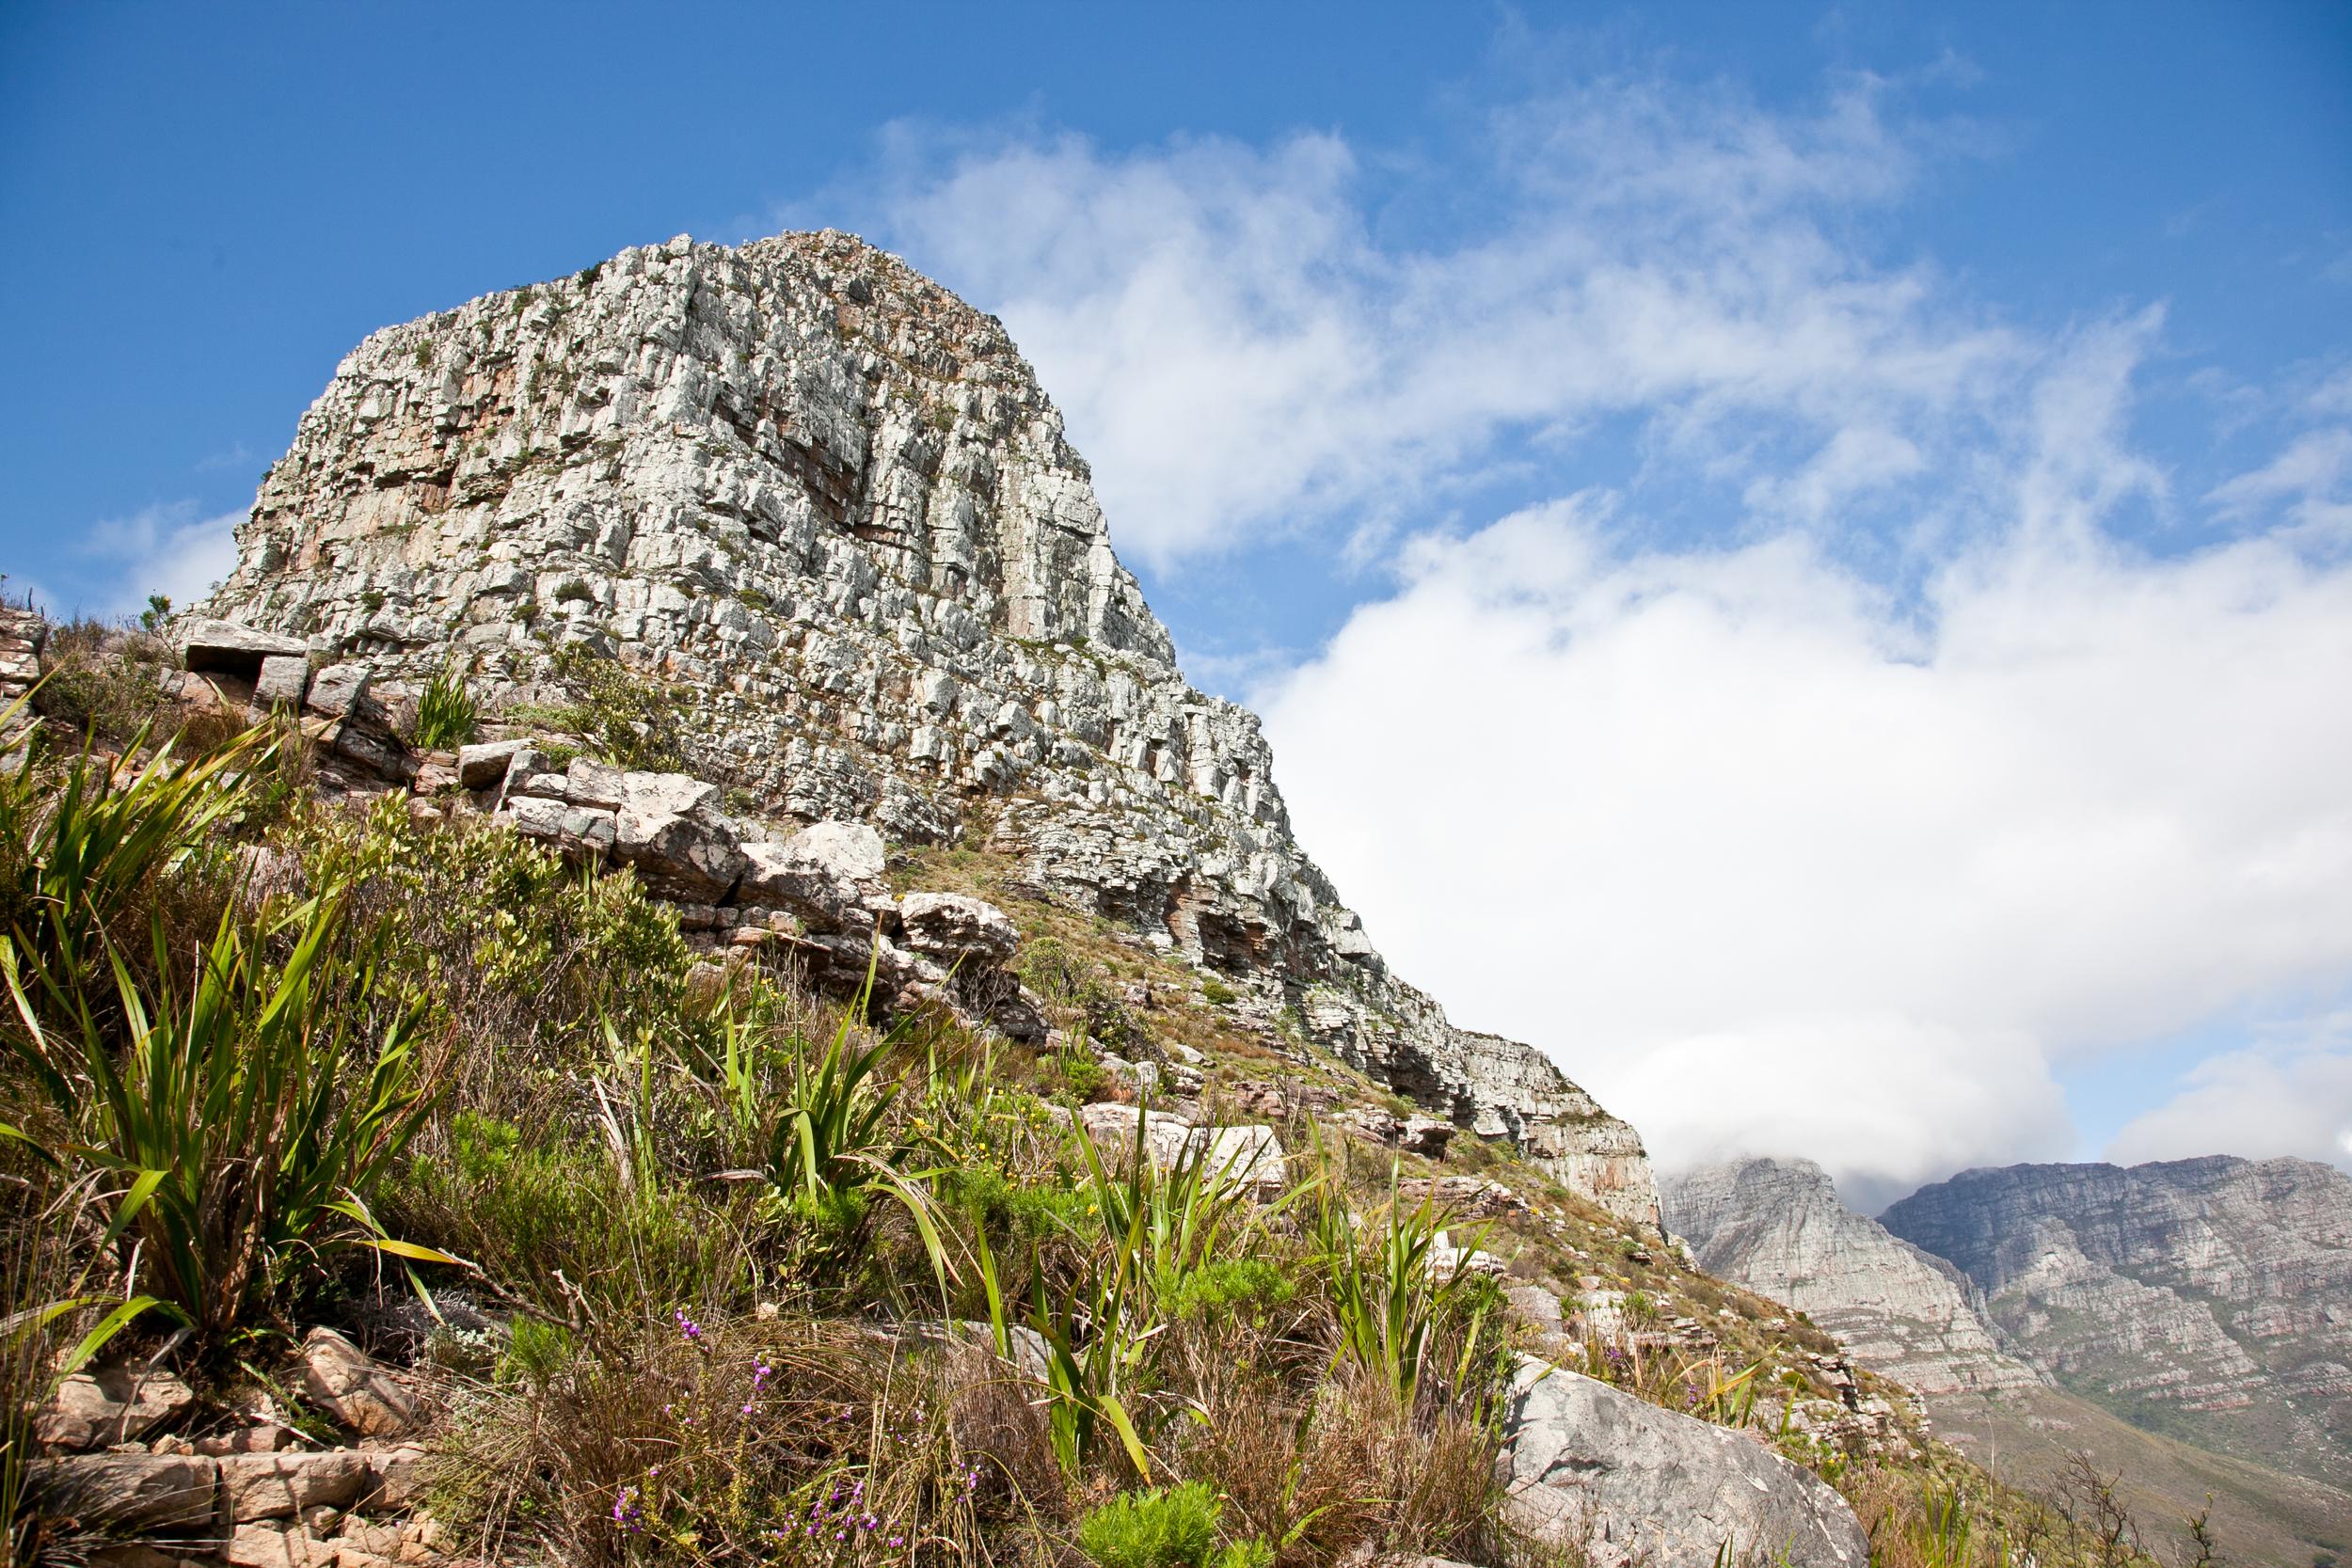 IMG_5027-hiking-lions-head-cape-town-trisa-taro.jpg